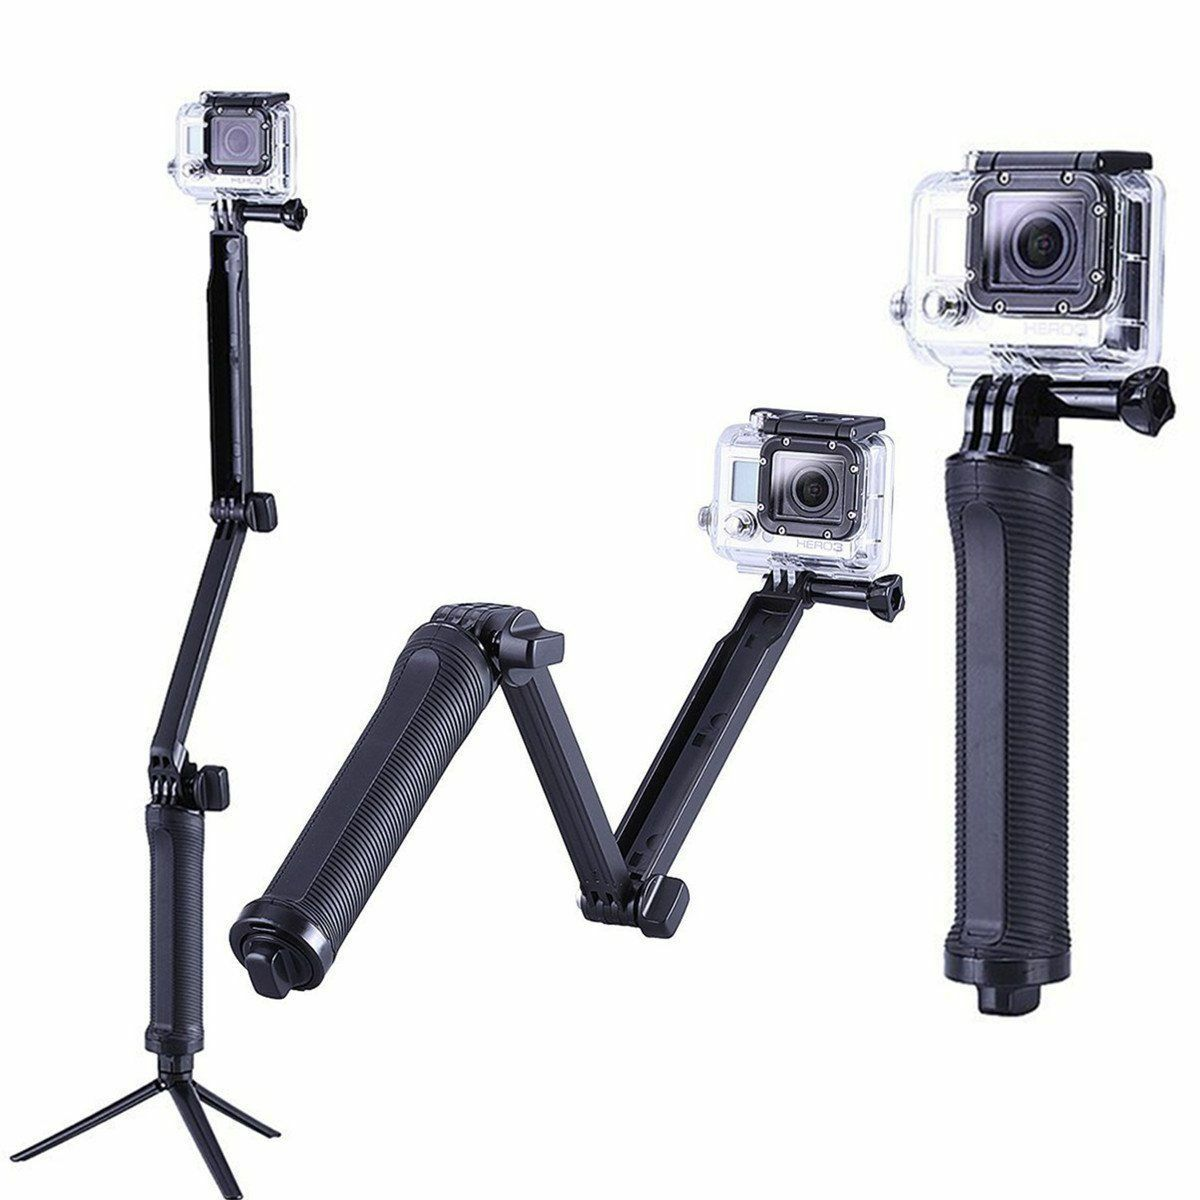 Three 3 way Selfie Handheld Stick Monopod Folding Holder for GoPro Hero 5 4 3 2